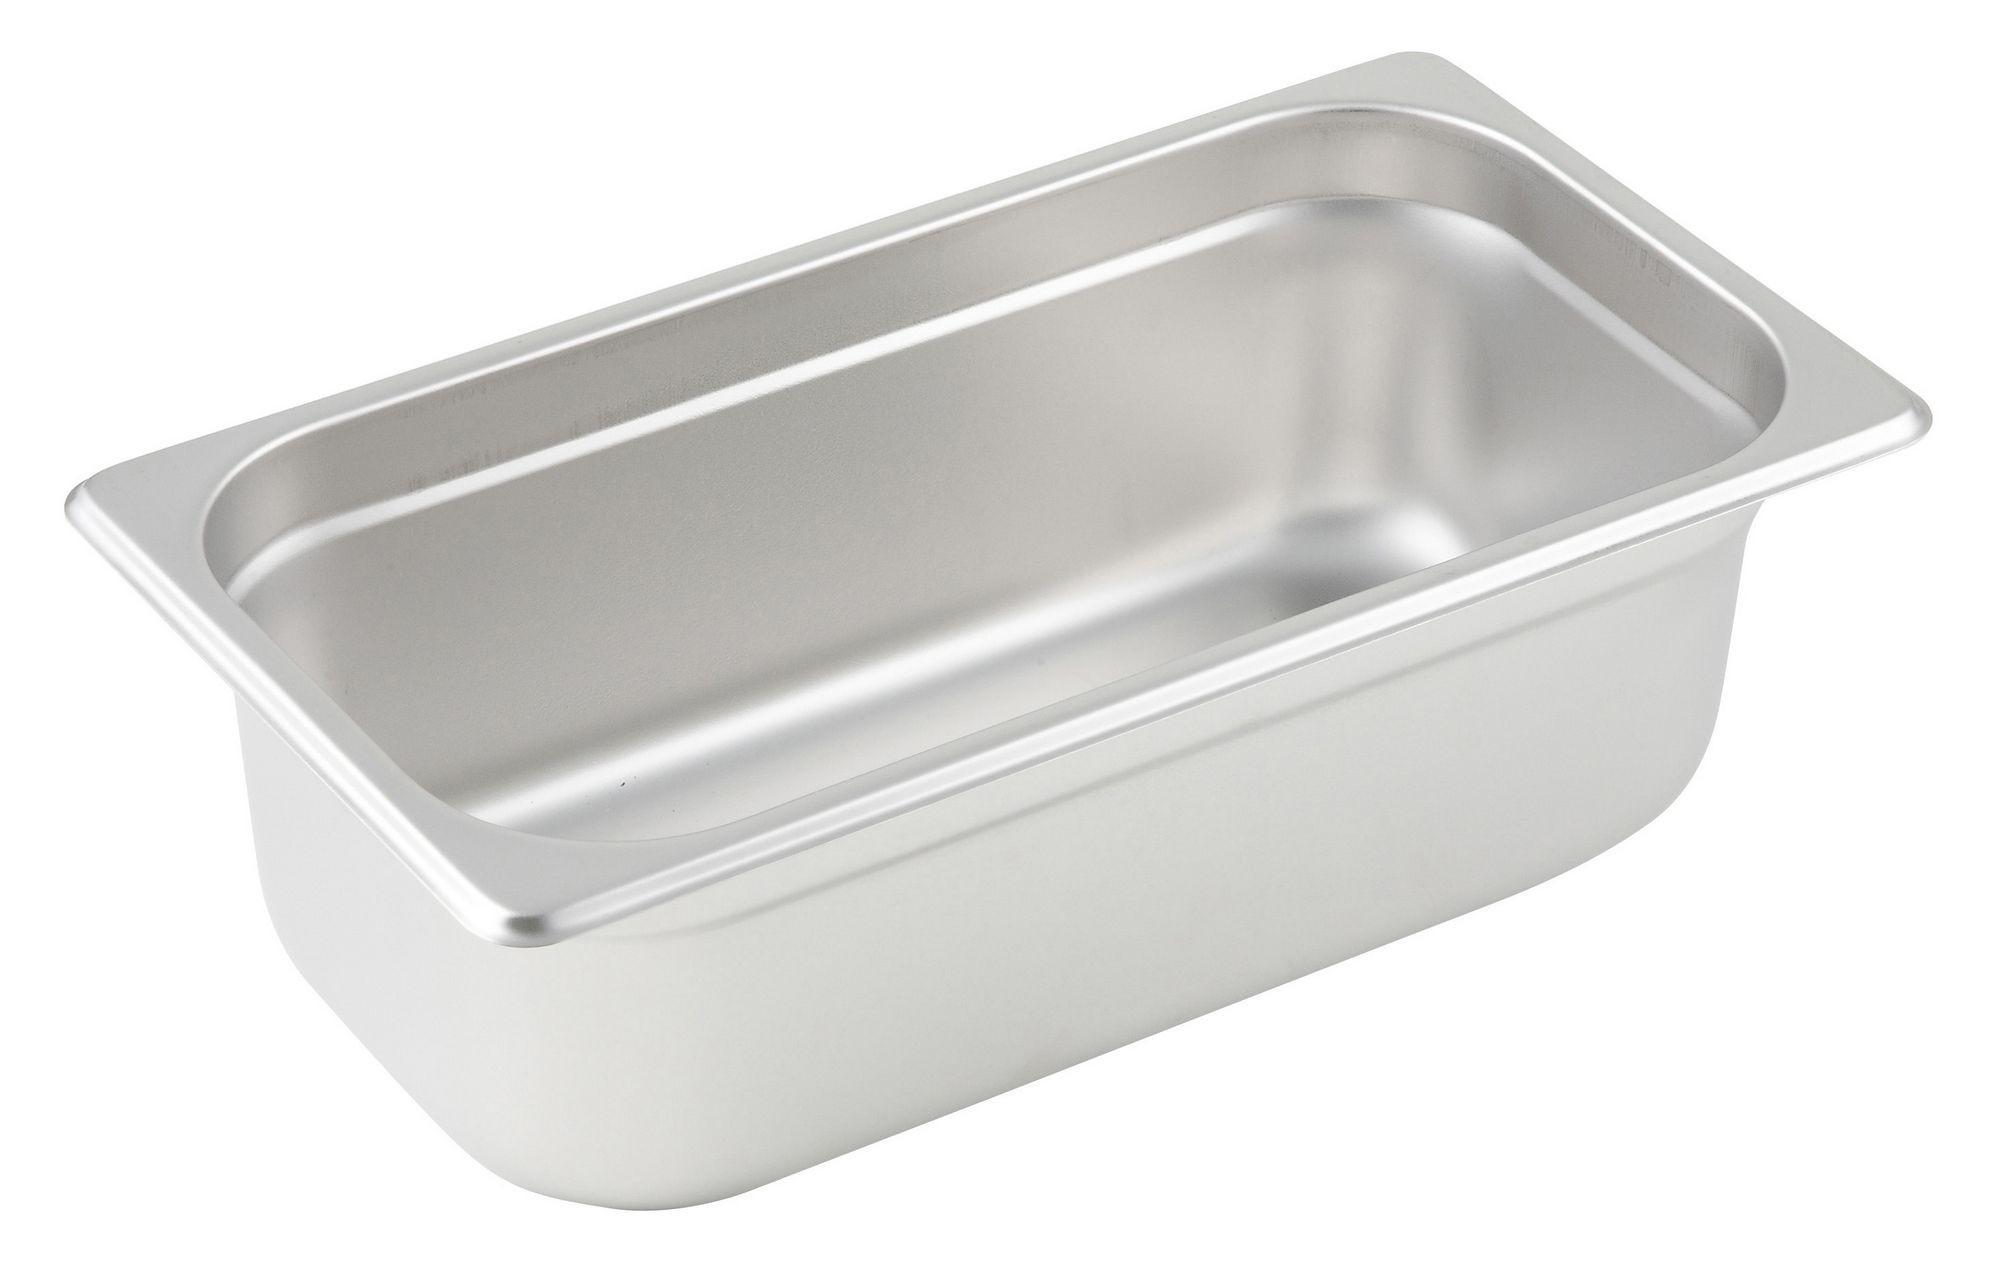 "Winco SPJM-304 1/3 Size Anti-Jam 24 Gauge Steam Table Pan 4"" Deep"